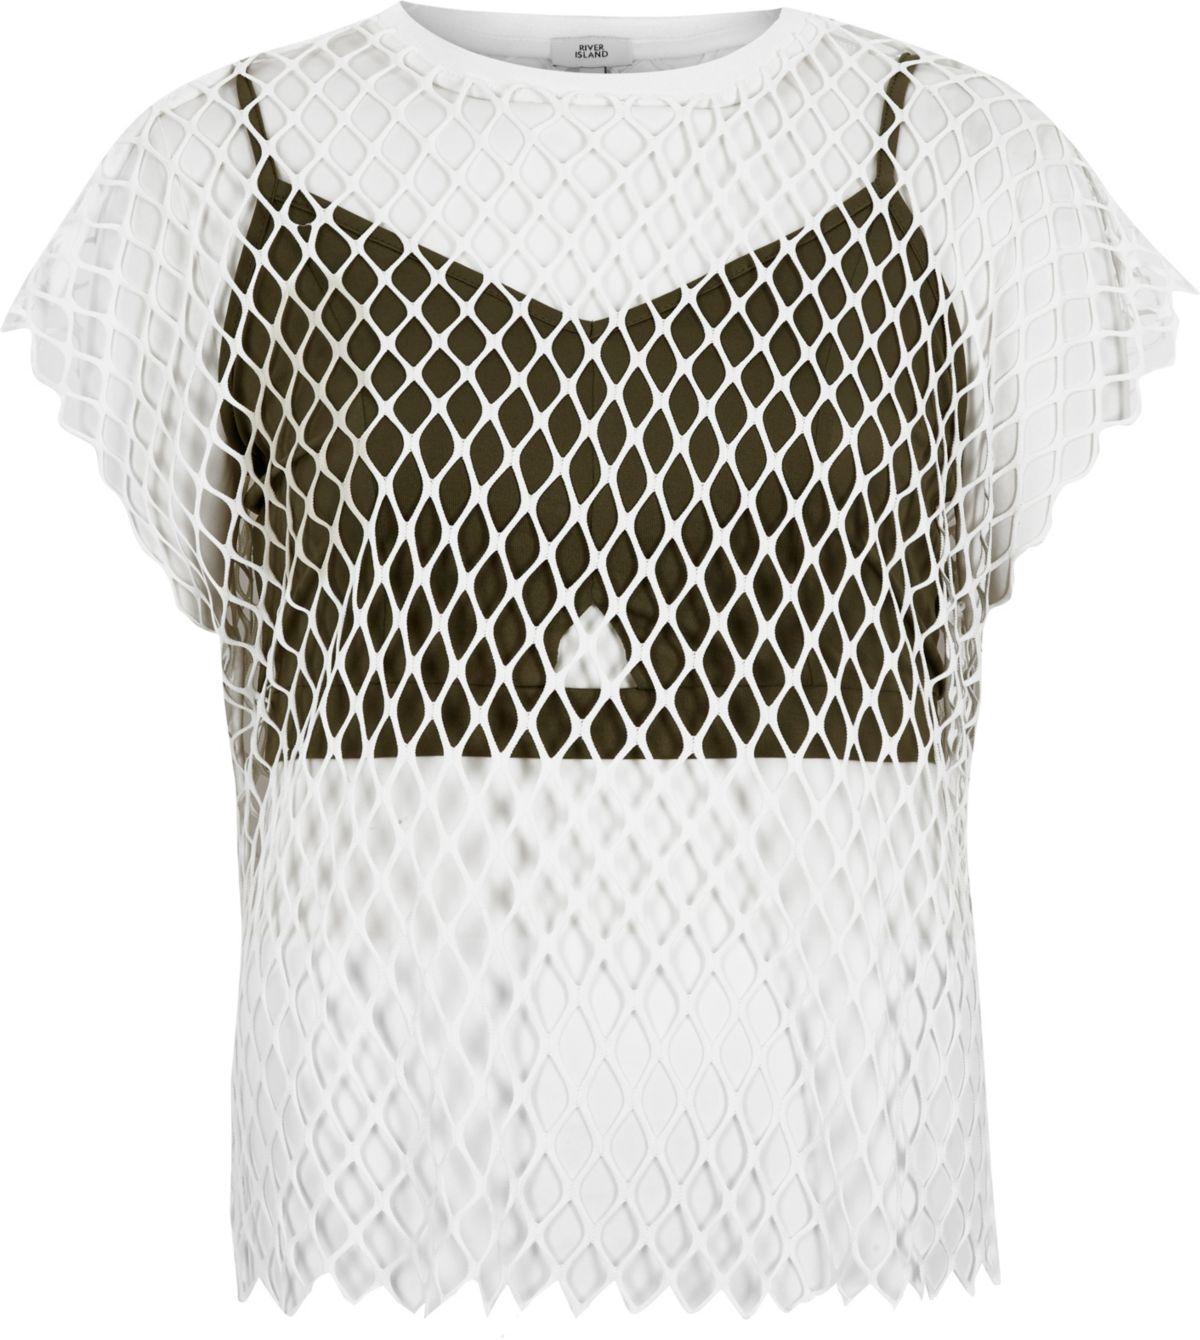 White mesh bralet T-shirt